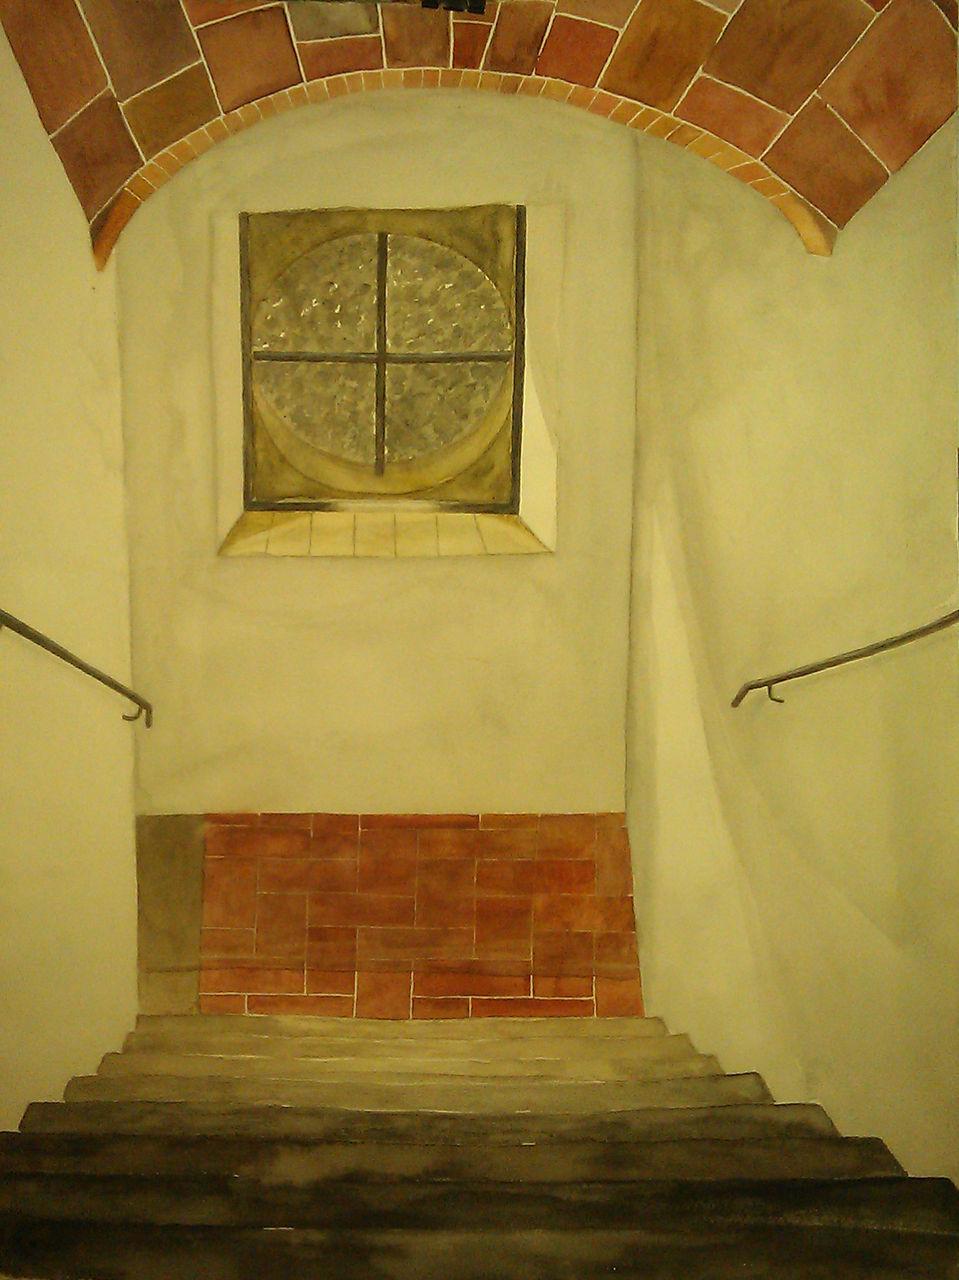 Bild malerei fenster hof von mareike bei kunstnet for Fenster zum hof